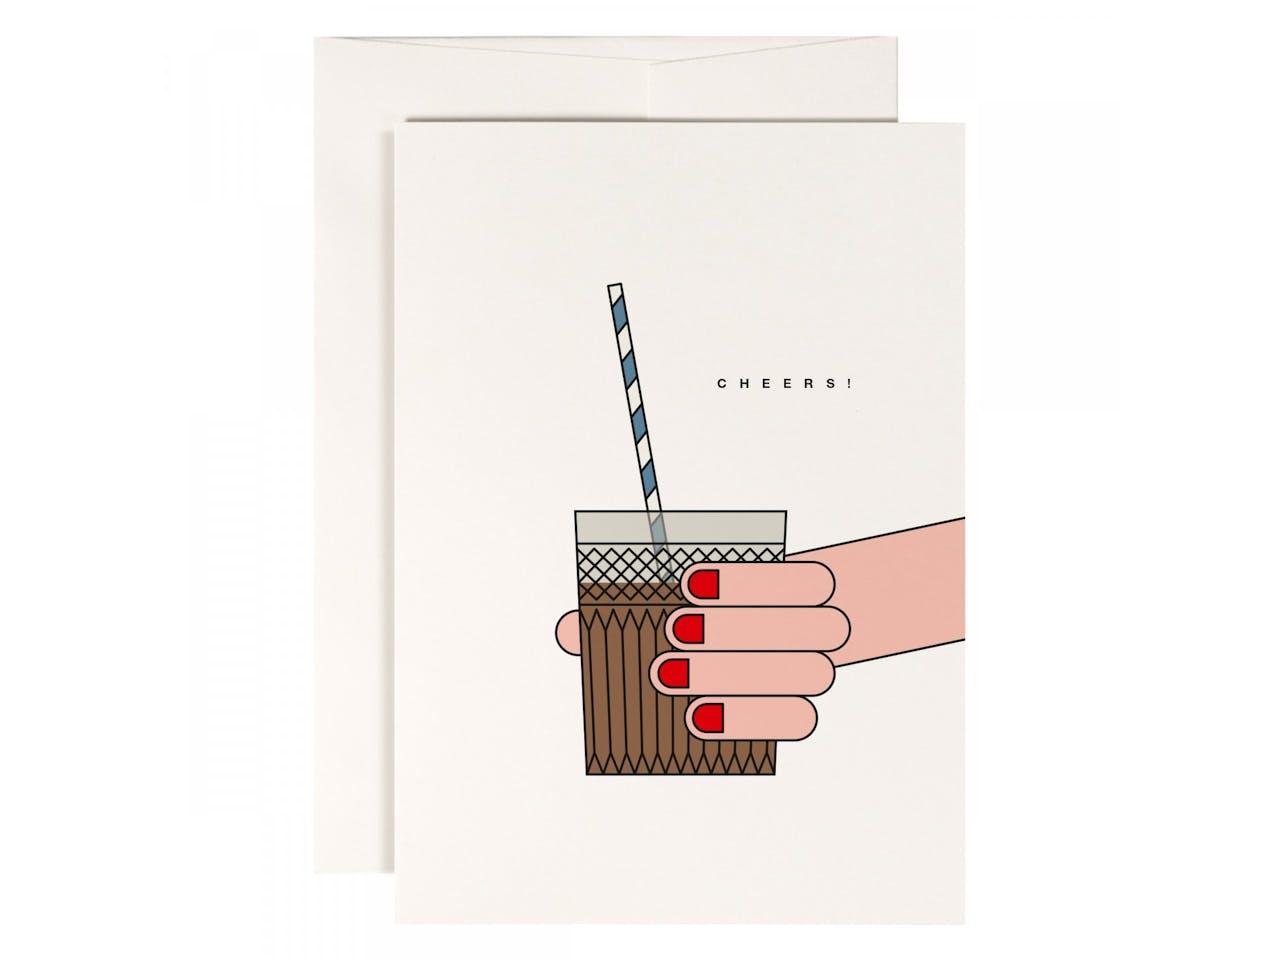 Redfries Grußkarte, DIN A6/C6, Klappkarte mit Kuvert, Cheers